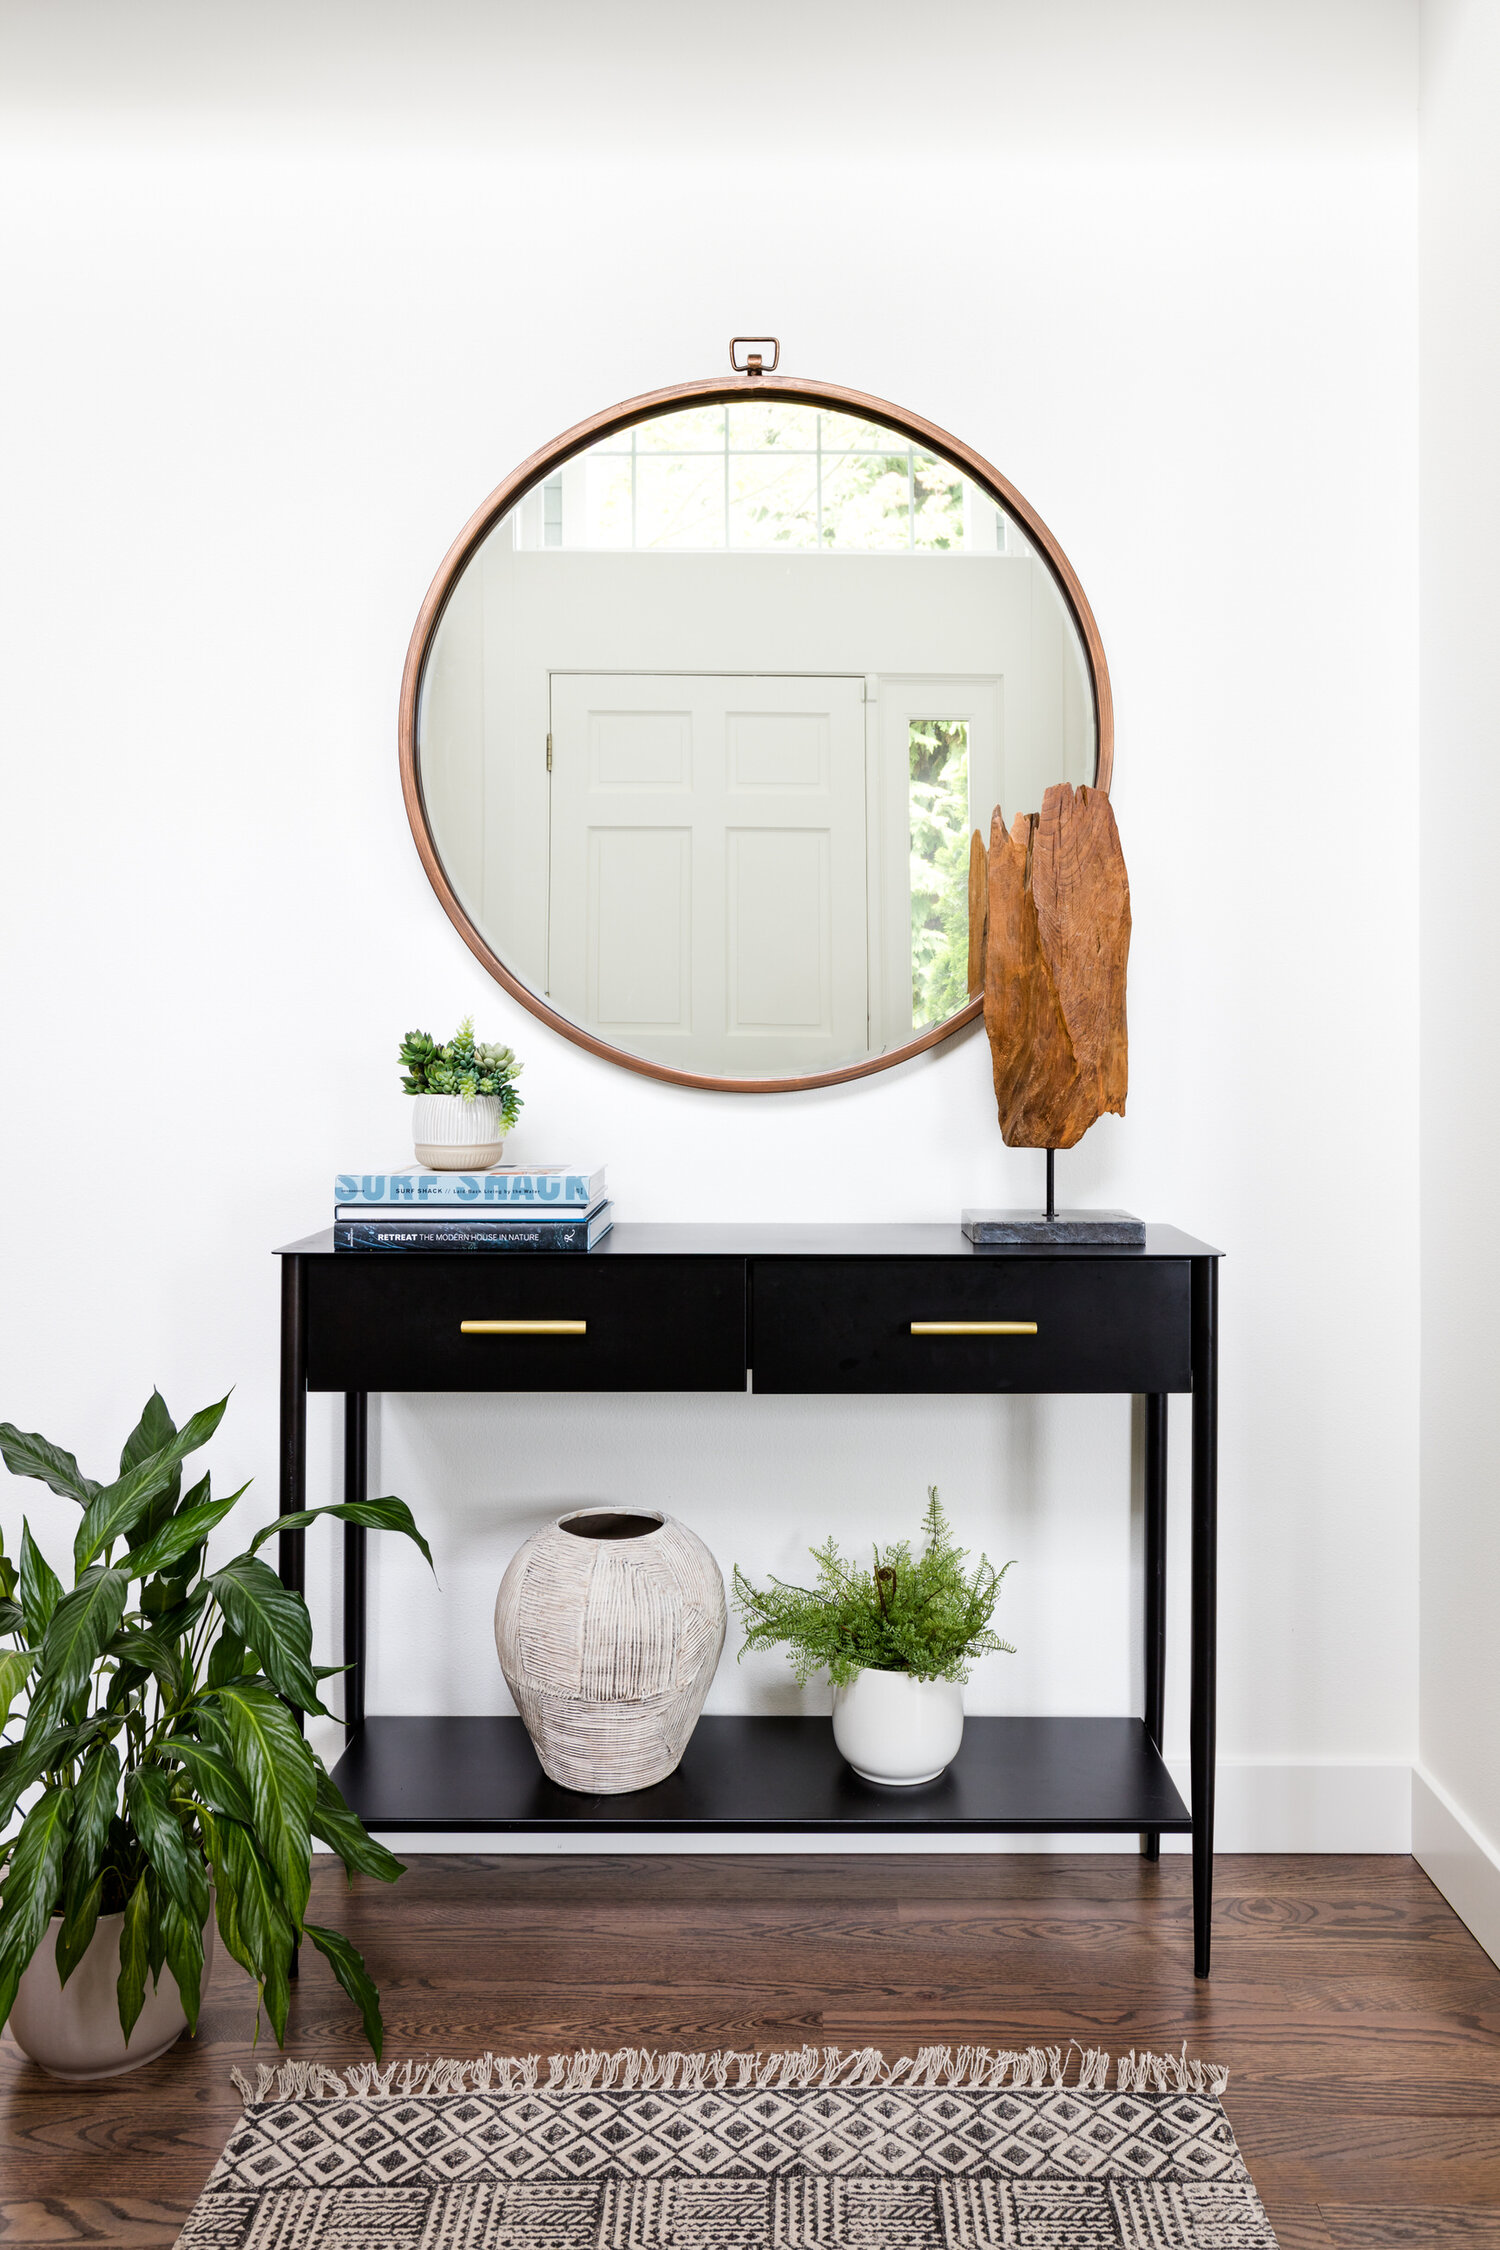 Interior Design In Seattle Bellevue Elegant Simplicity